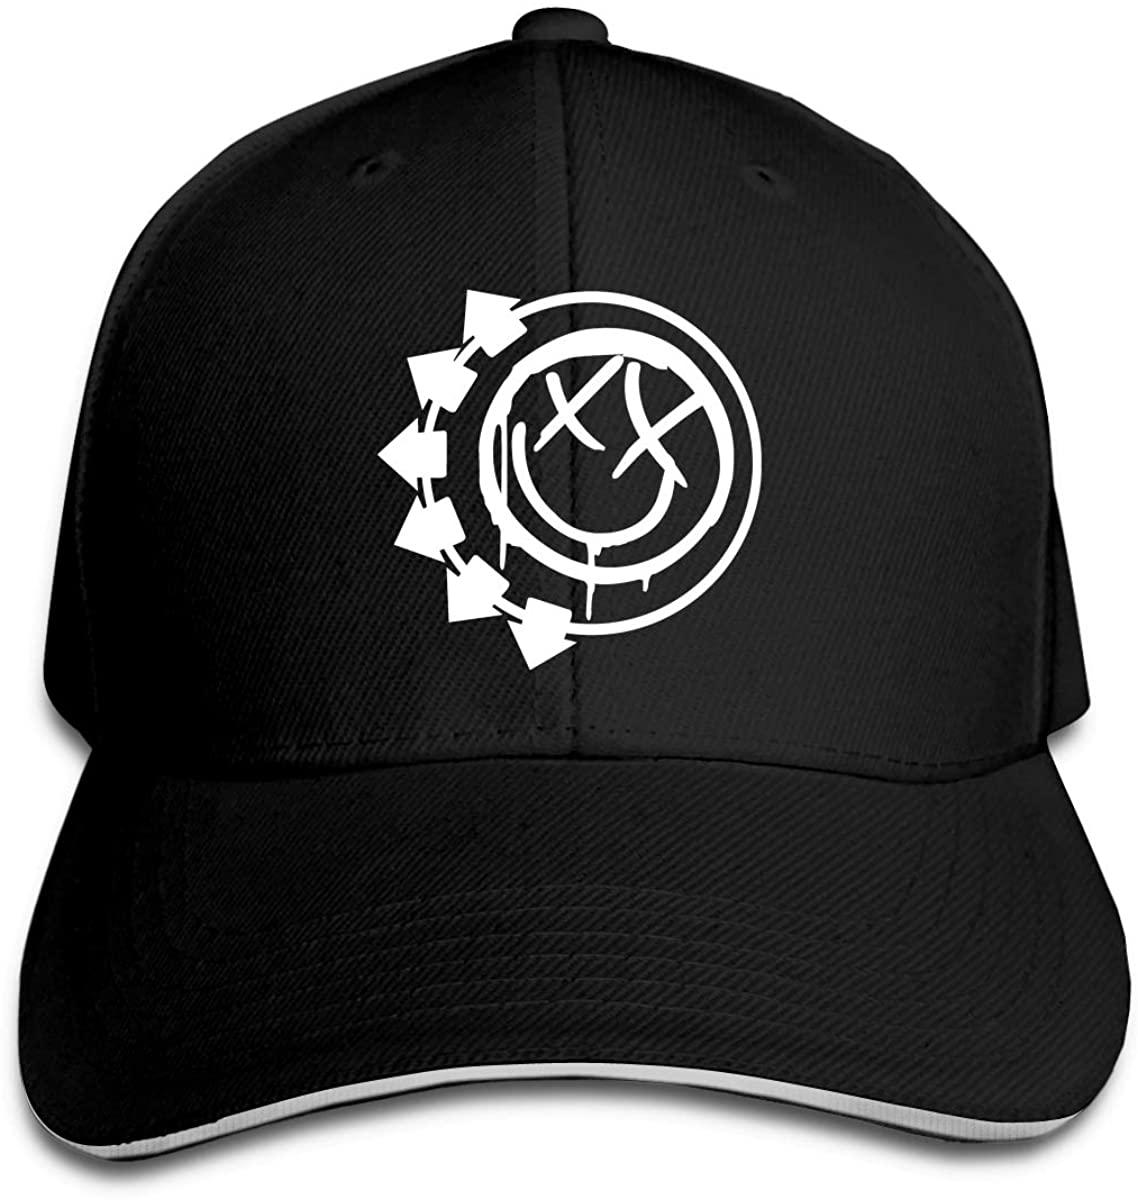 Blink 182 EU Deck Classic Baseball Cap Unisex Cotton Adjustable Hat for Kids Teens Adults